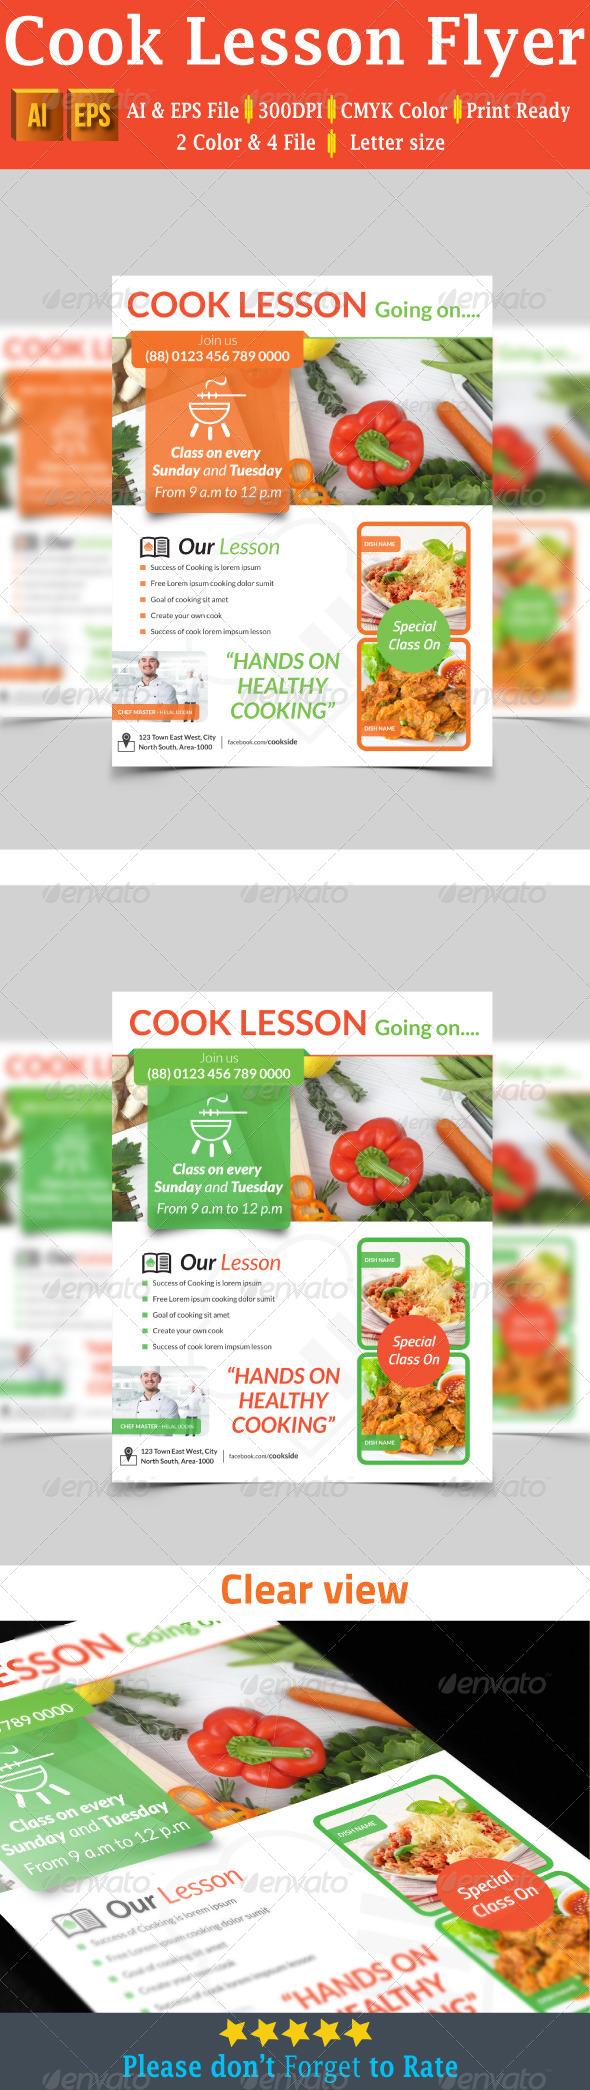 GraphicRiver Cook Lesson Flyer 7778813